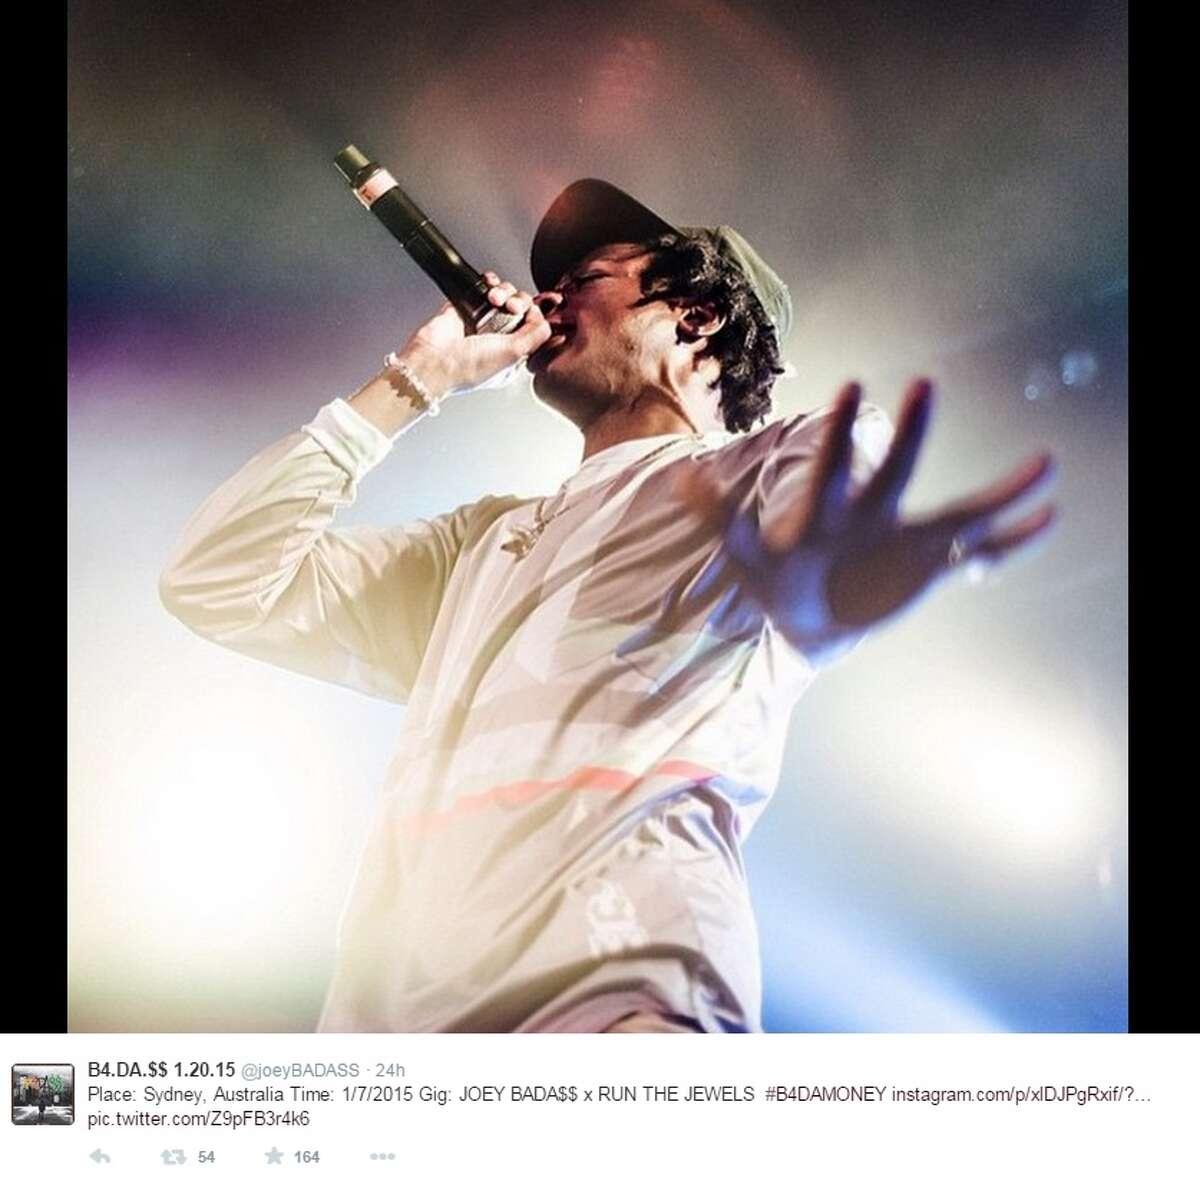 Photo of rapper Joey Bada$$ shared on Twitter.